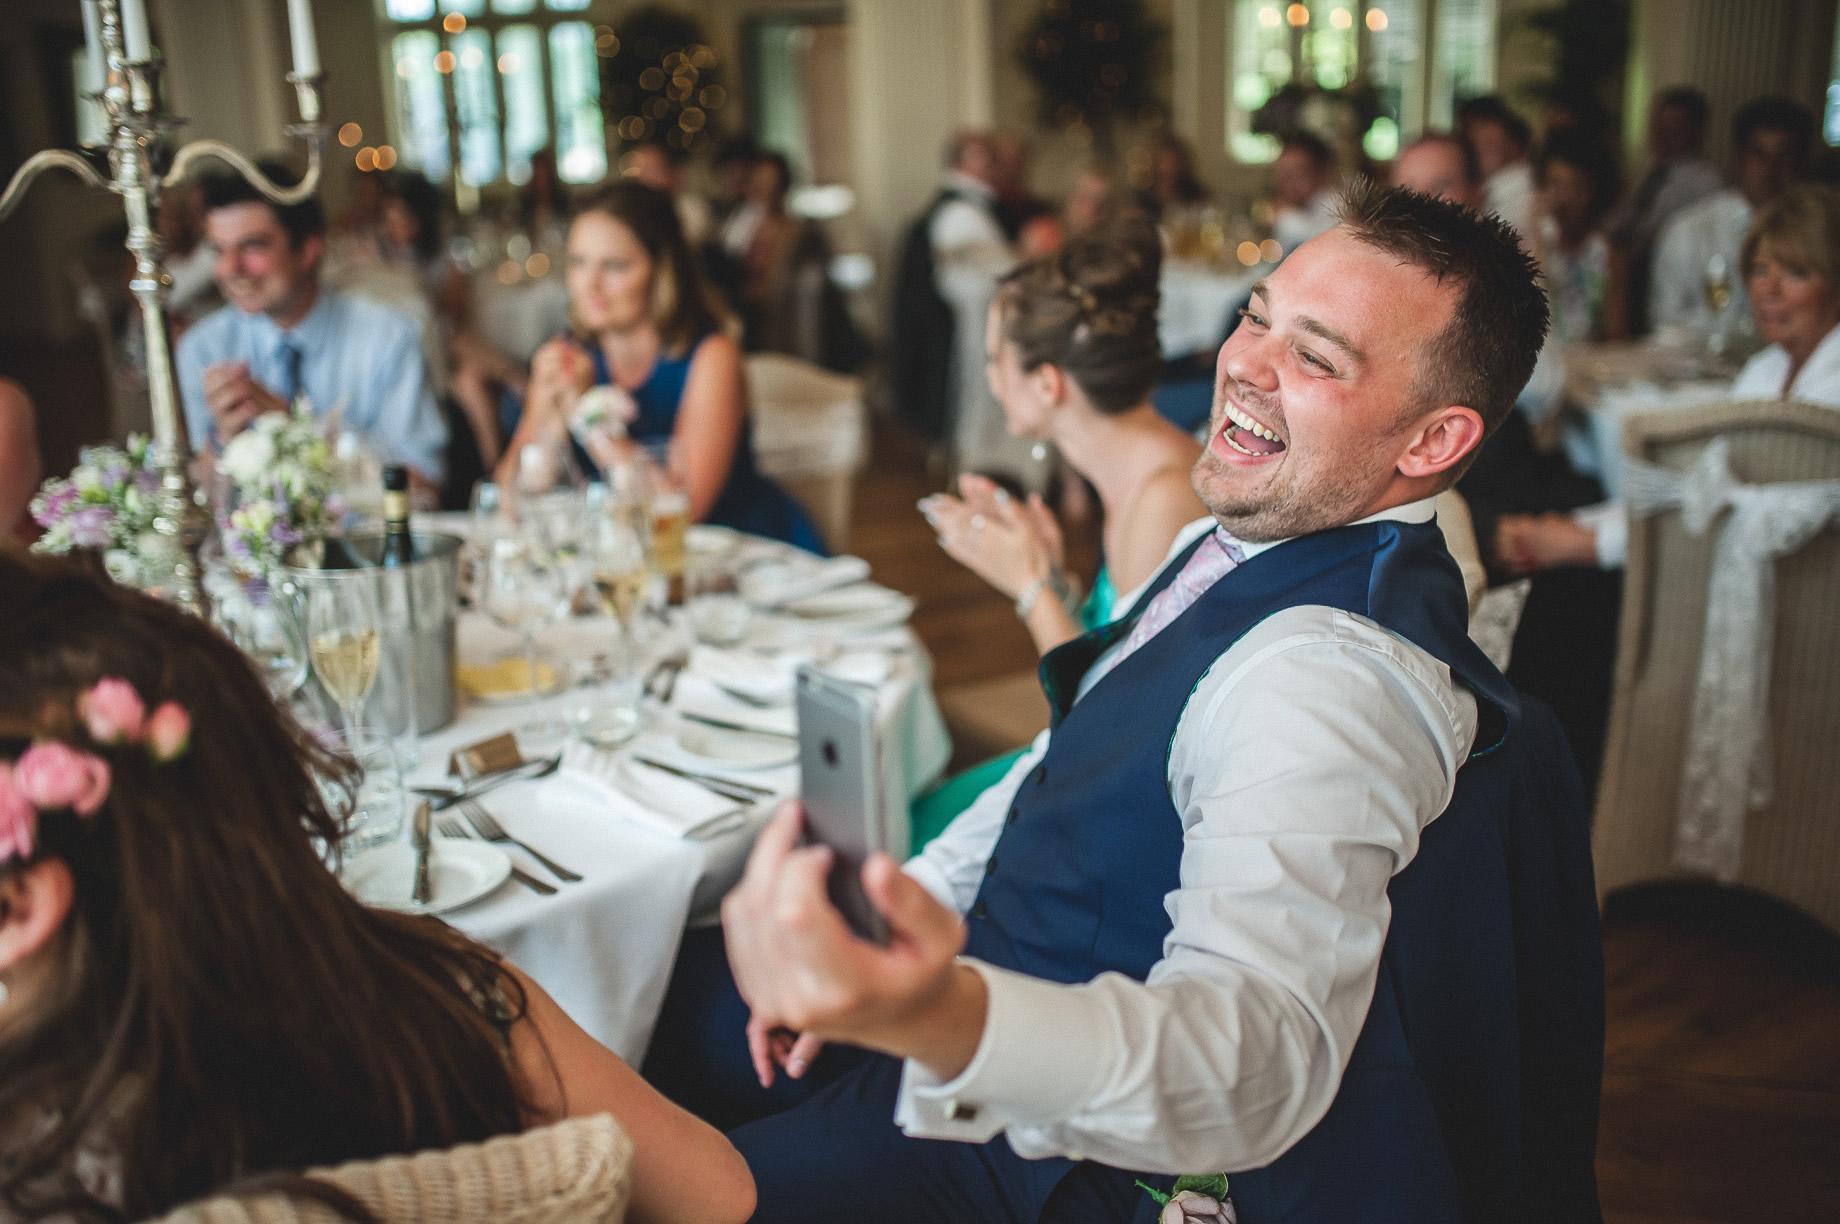 Helen and Matt's Wedding at Mitton Hall 093